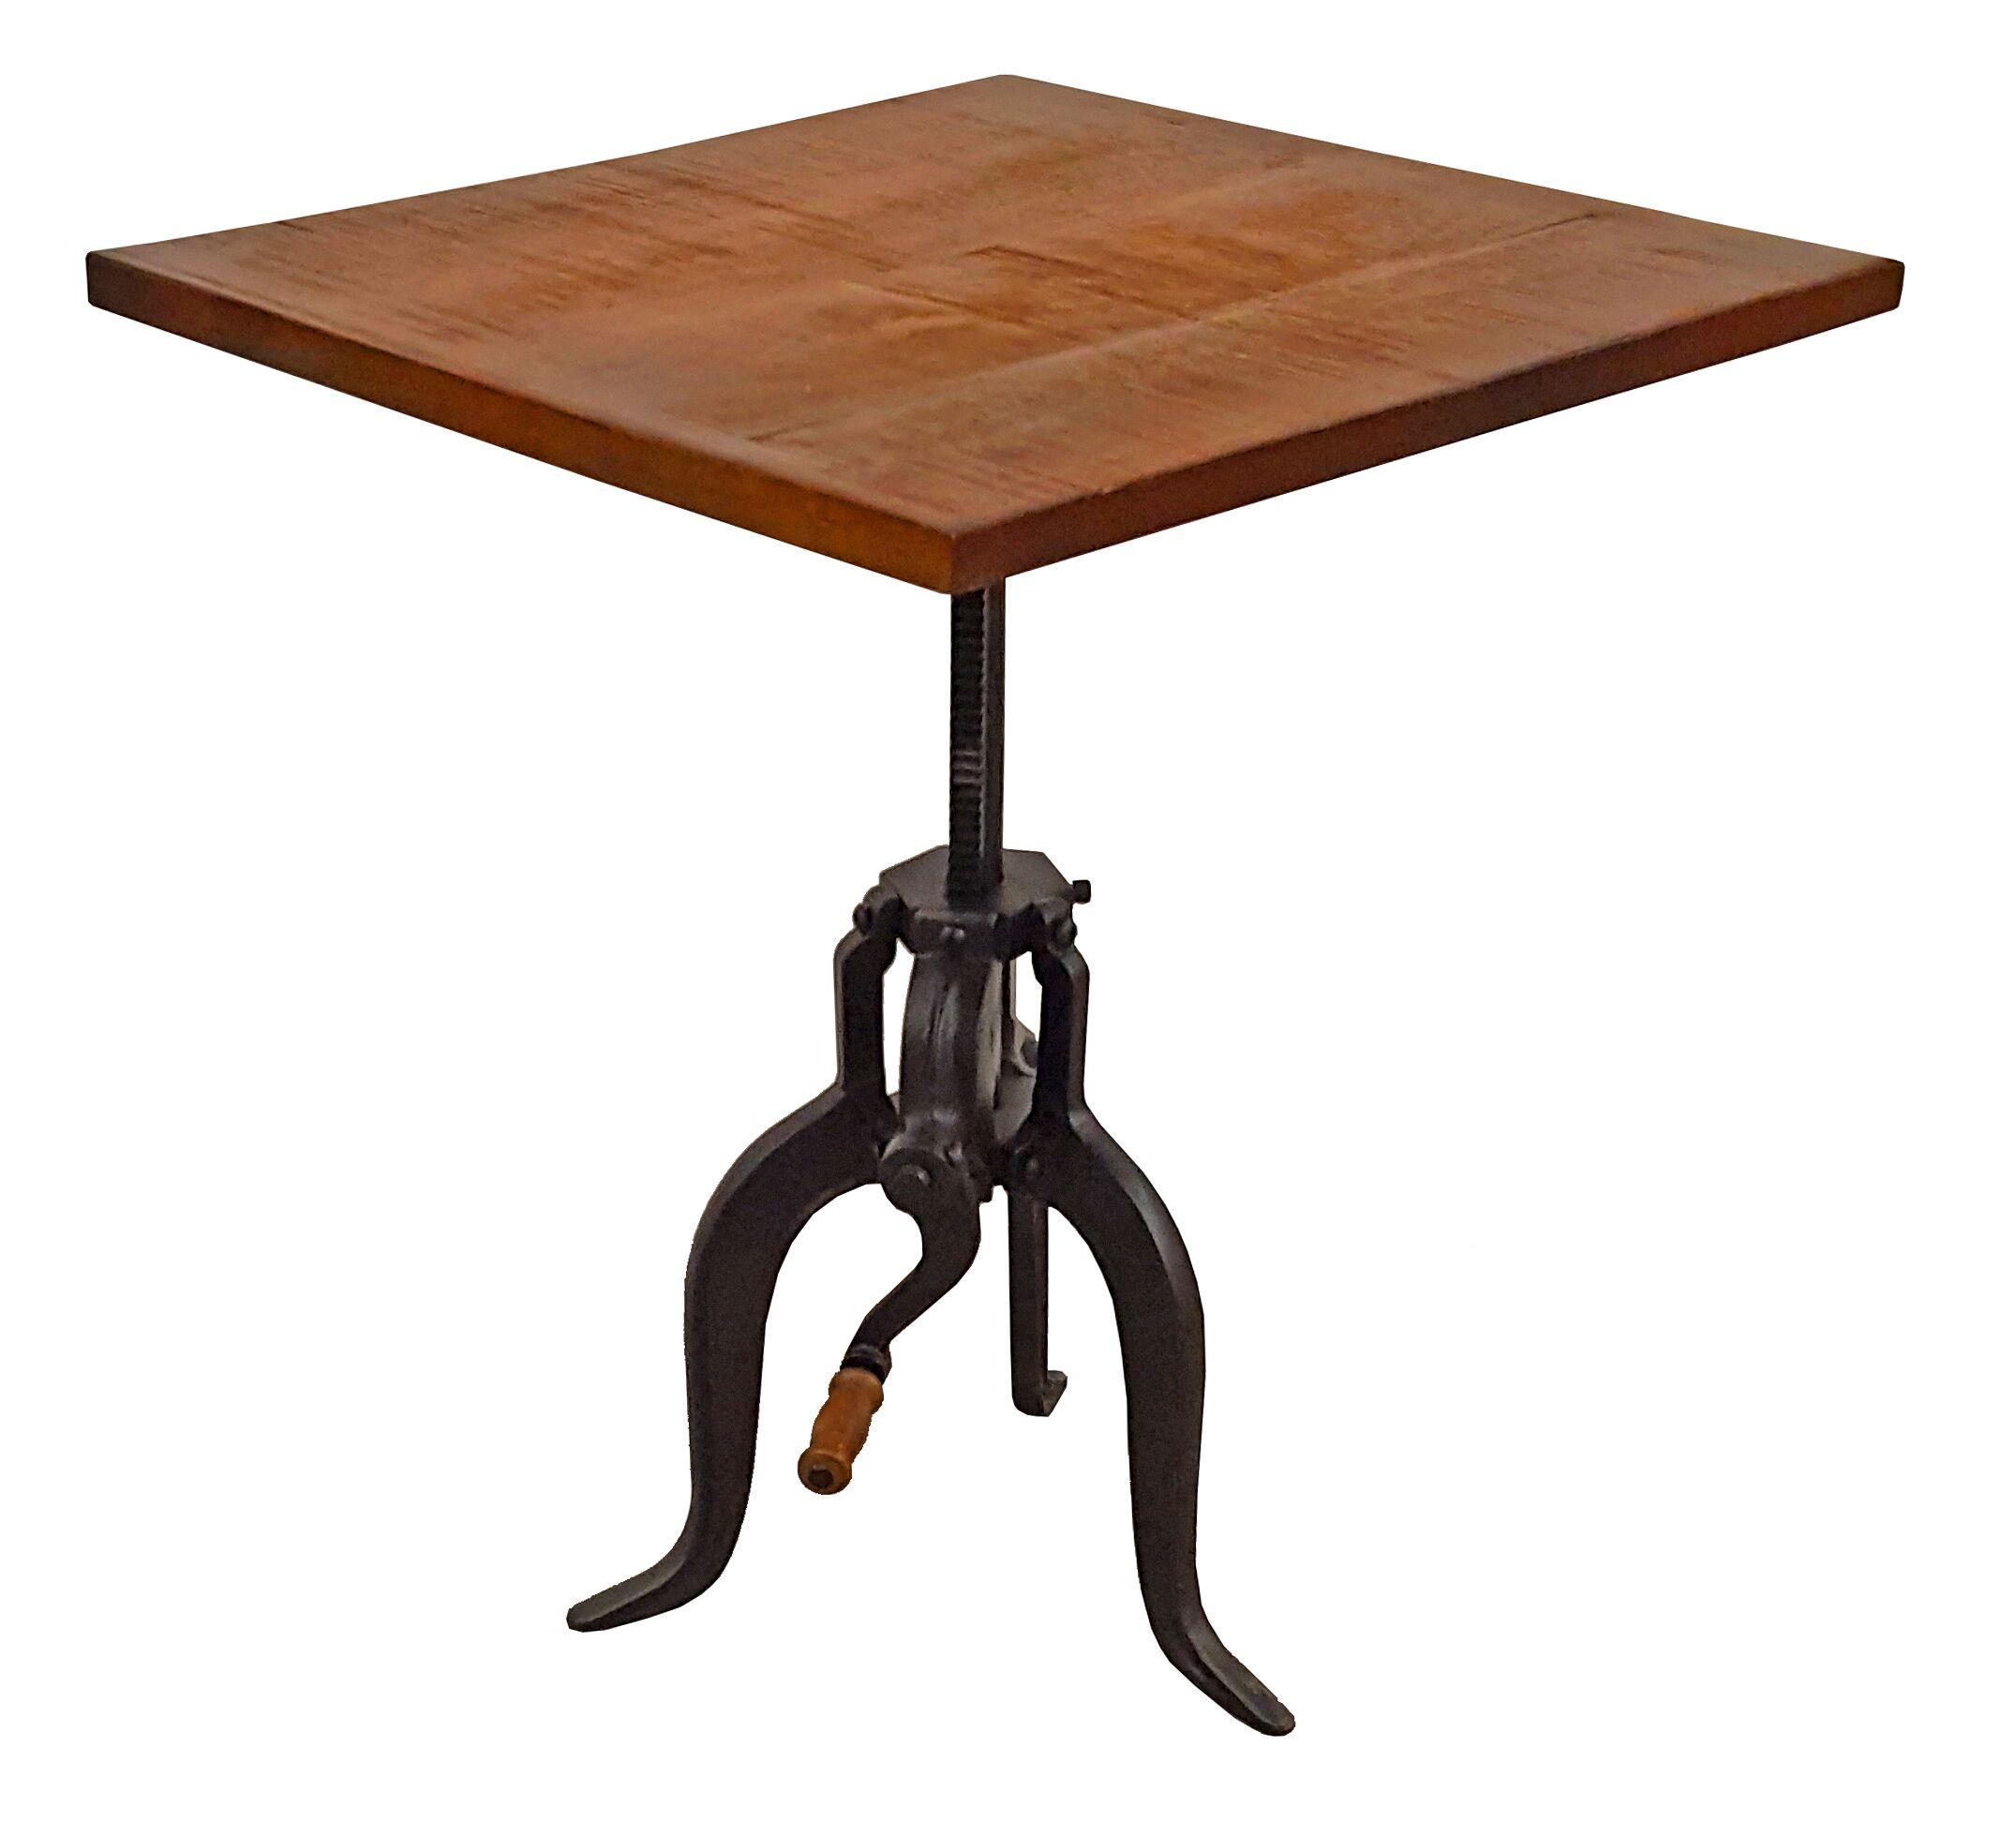 Wiedman Adjustable Height End Table